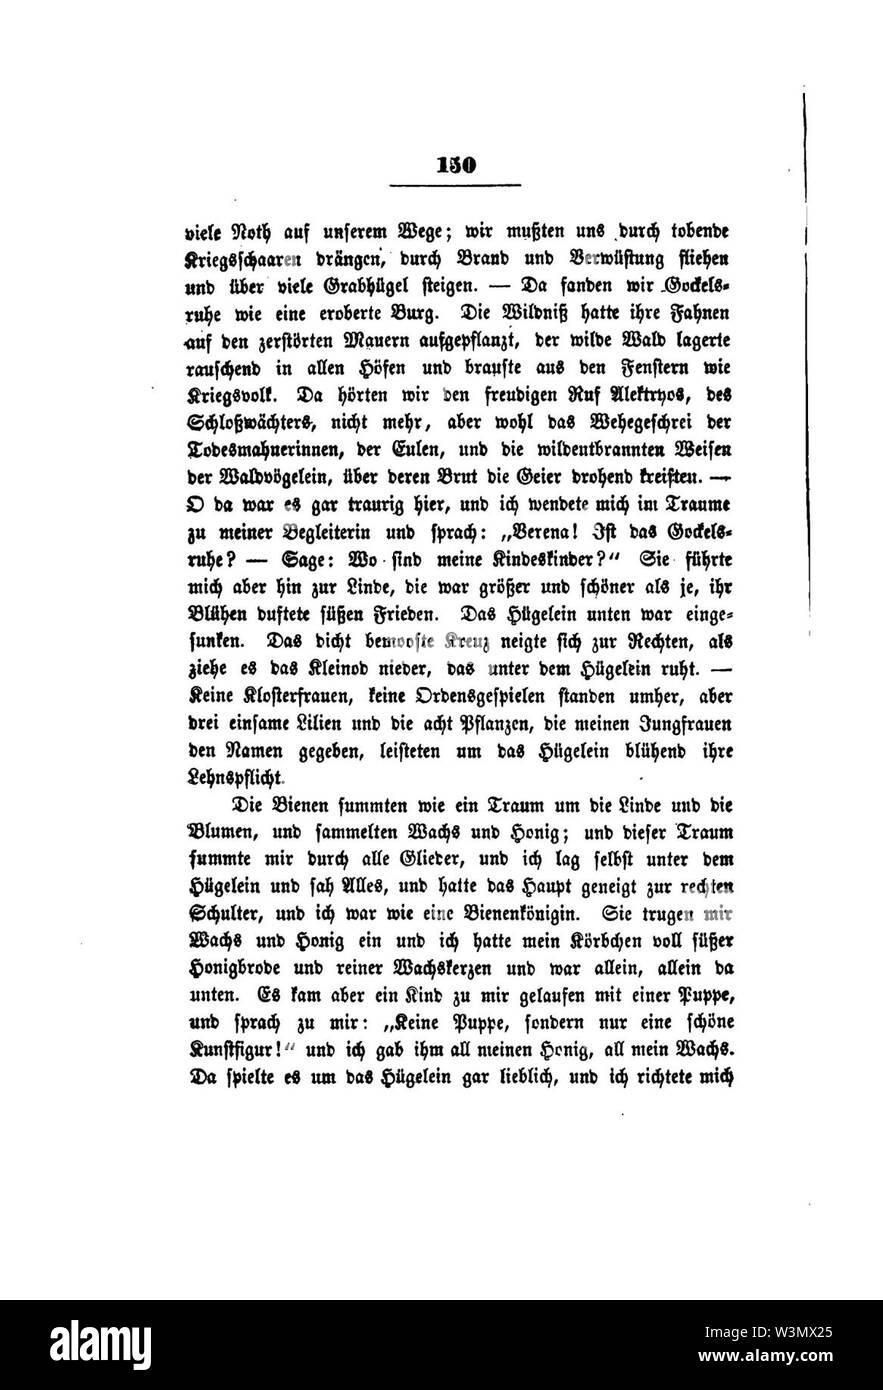 Clemens Brentano's gesammelte Schriften IV 150. - Stock Image